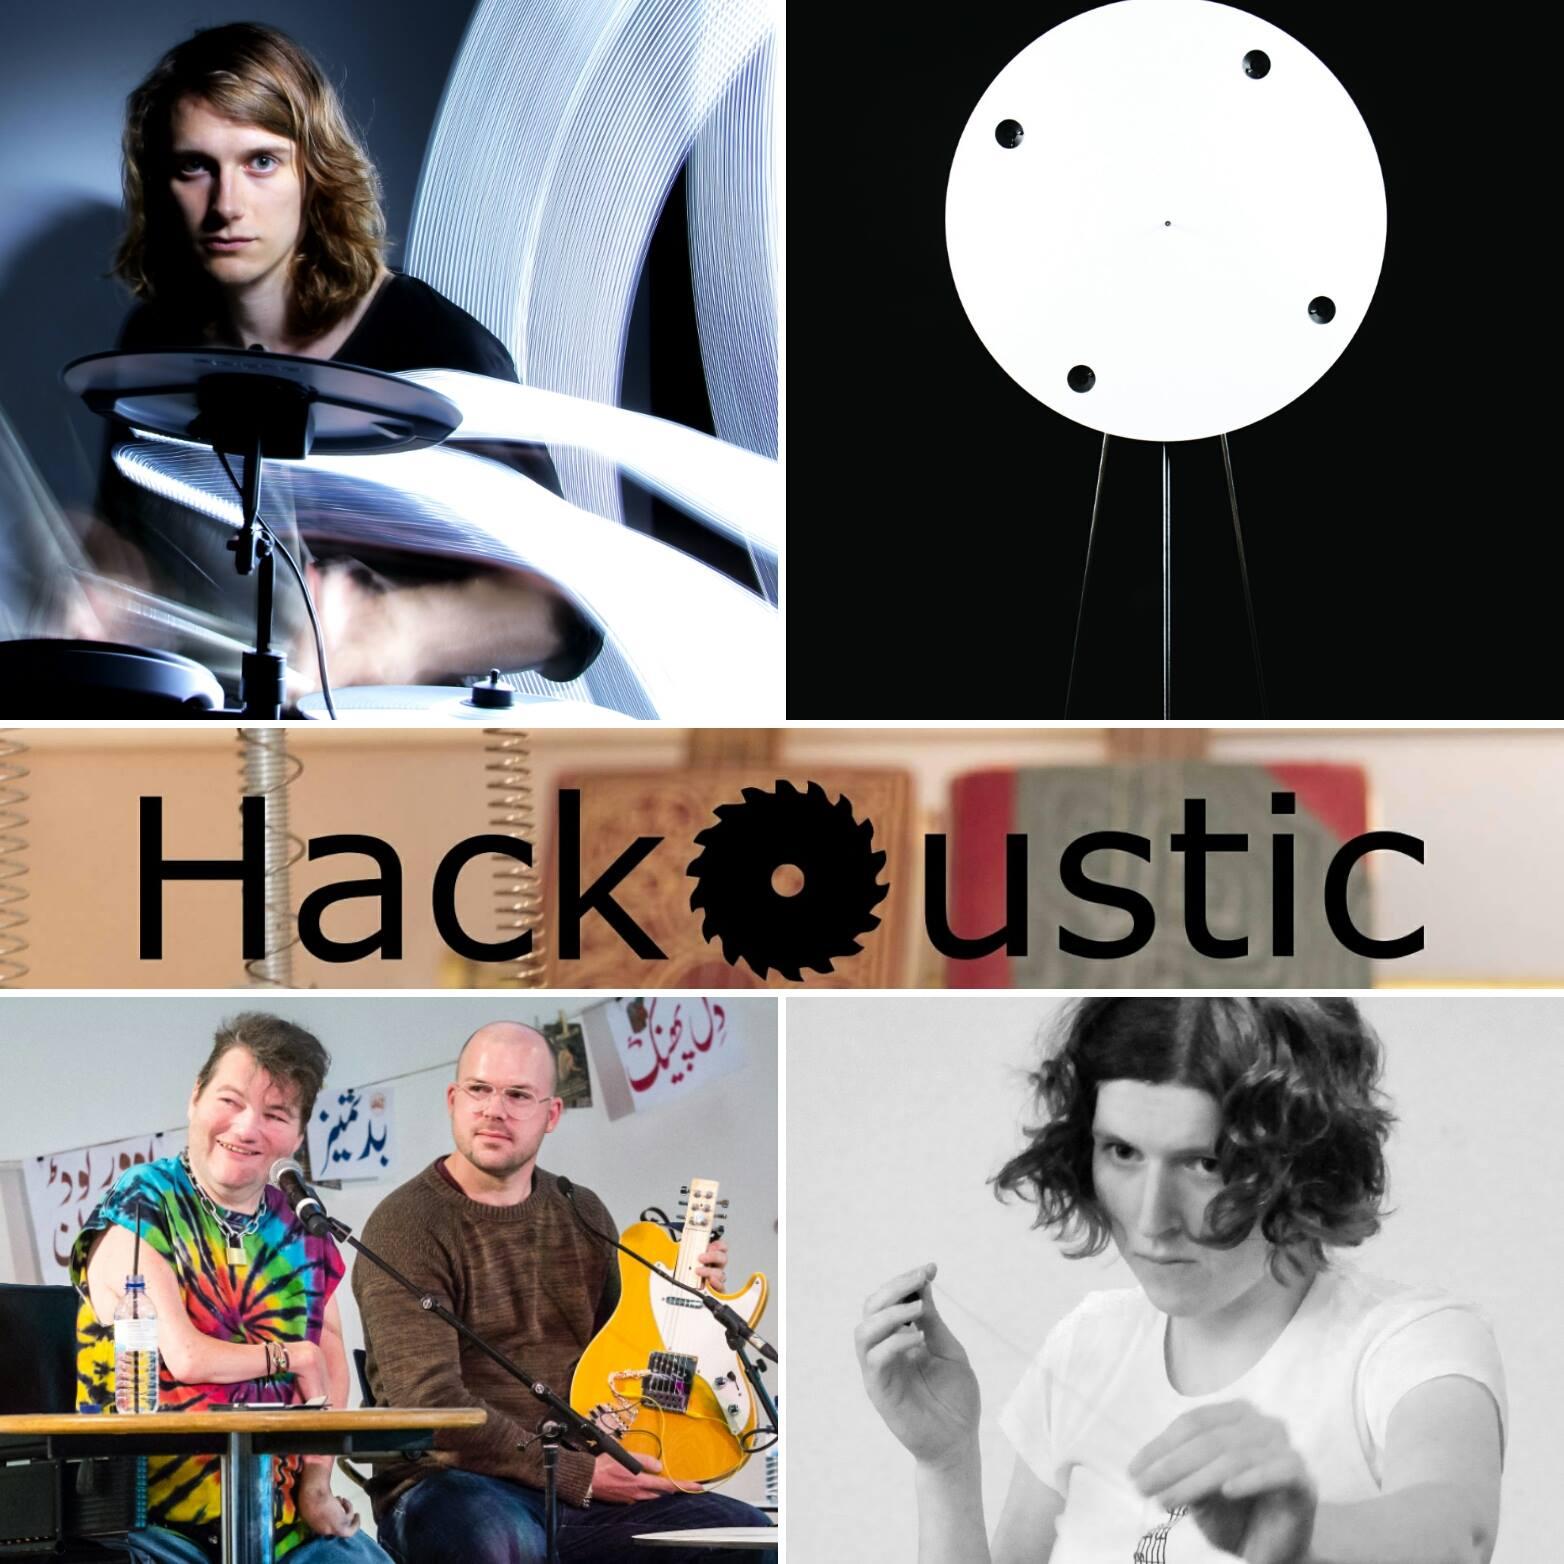 Hackoustic Presents